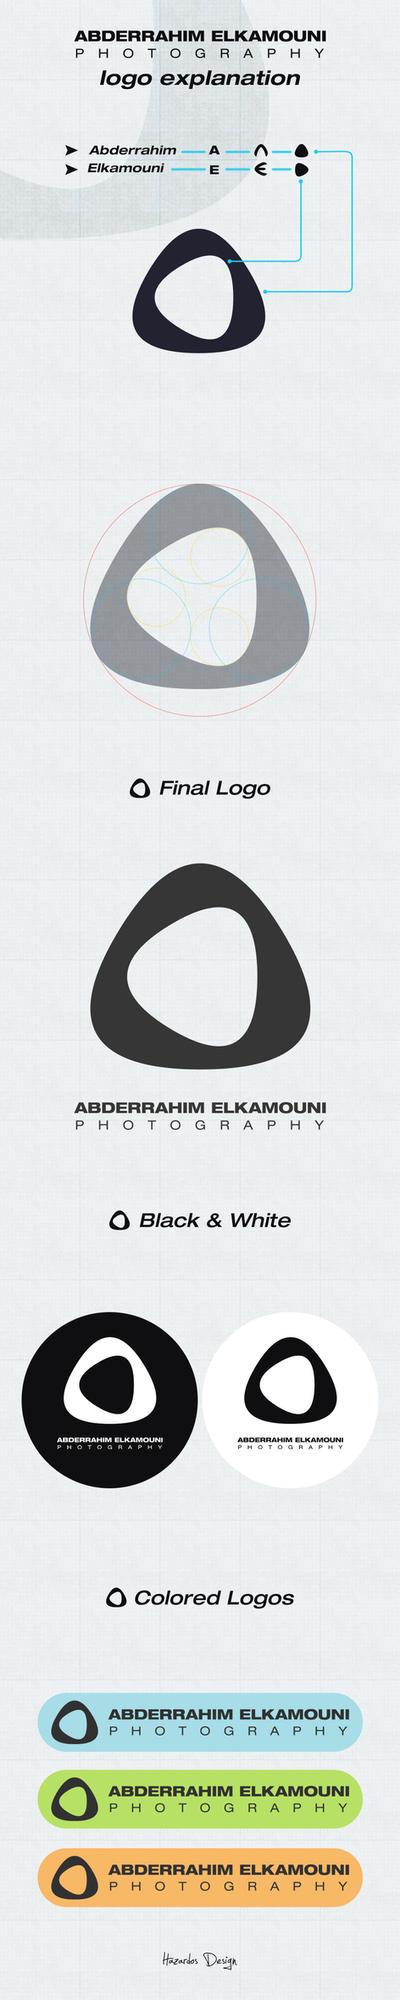 Abderrahim Elkamouni Photography Logo Explanation by HAZARDOS